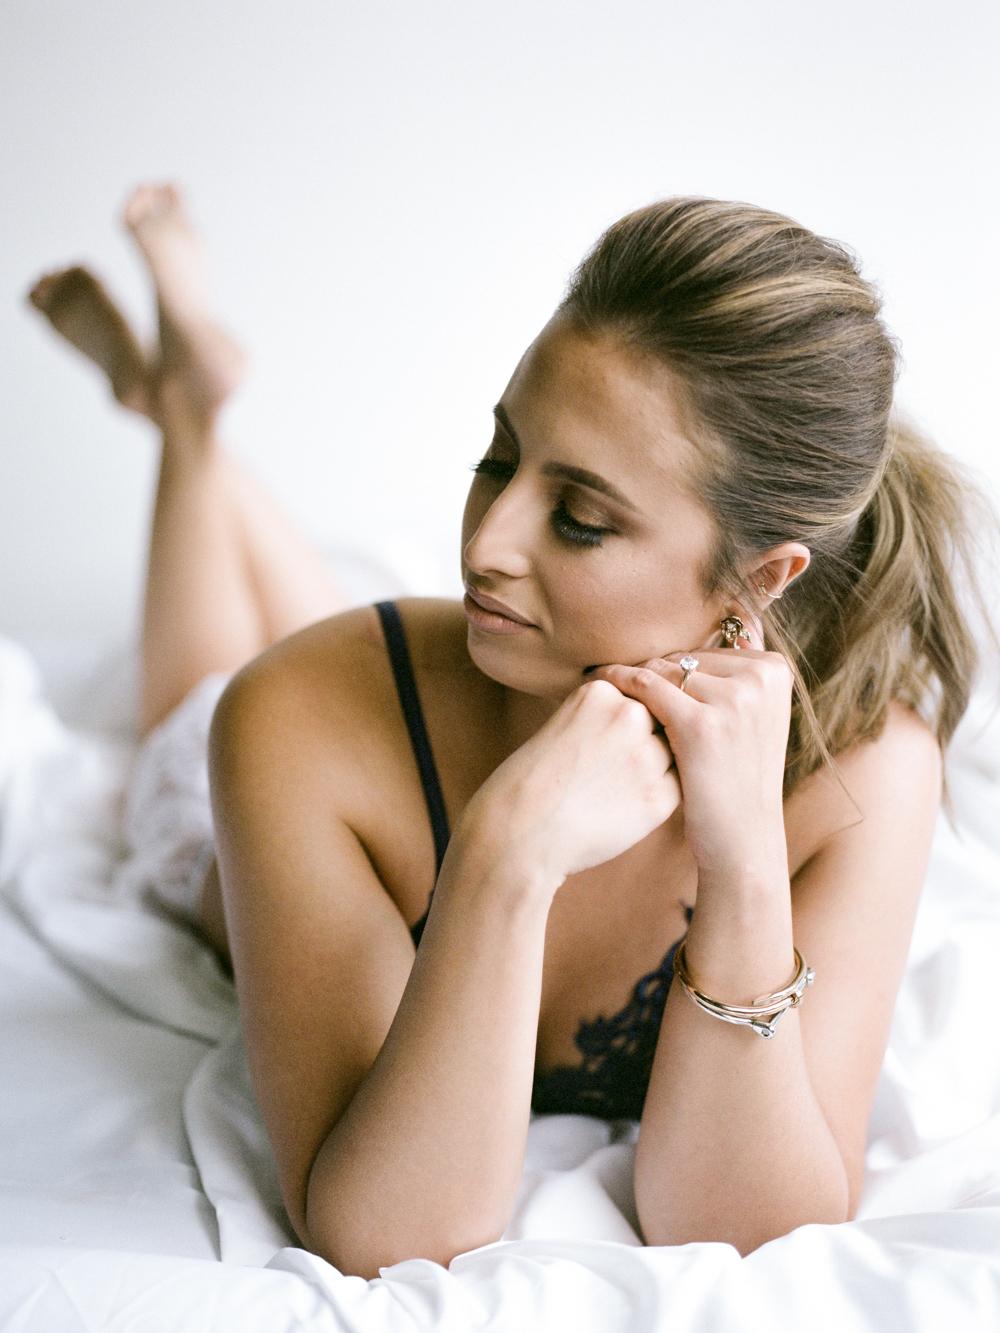 Christine-Gosch-Houston-boudoir-photographer-film-photography-fill-in-the-blank-wedding-photographer-5.jpg